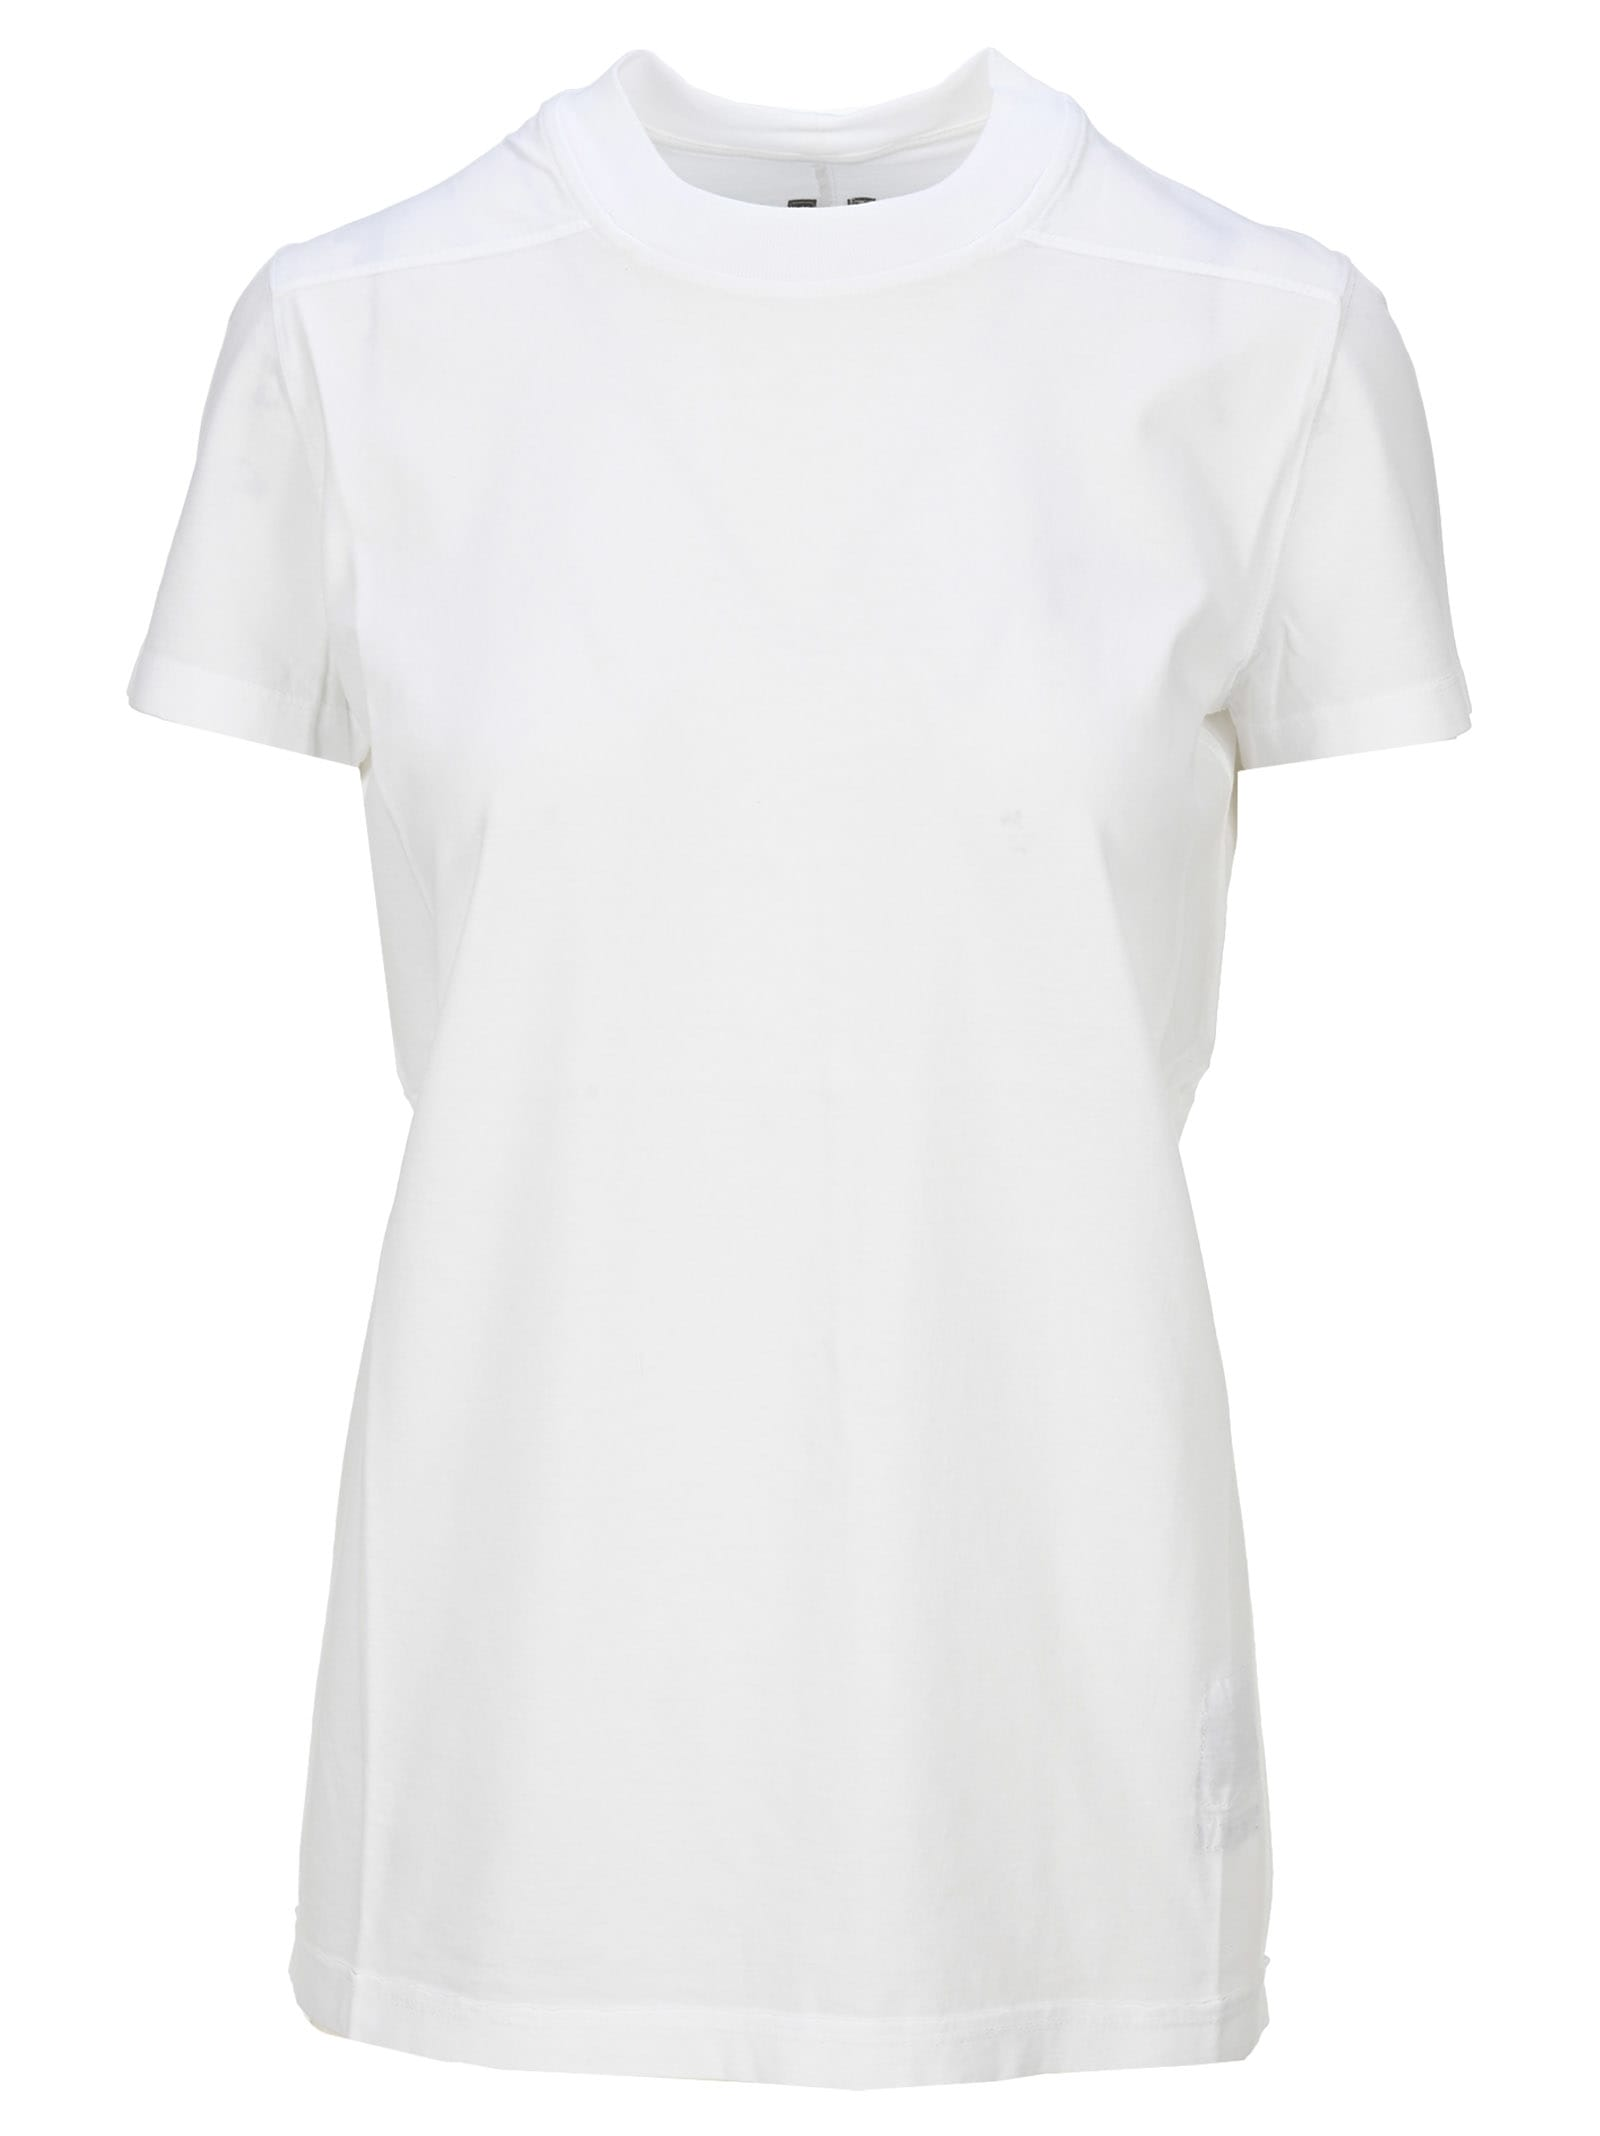 Dark Shadow Jersey T-shirt